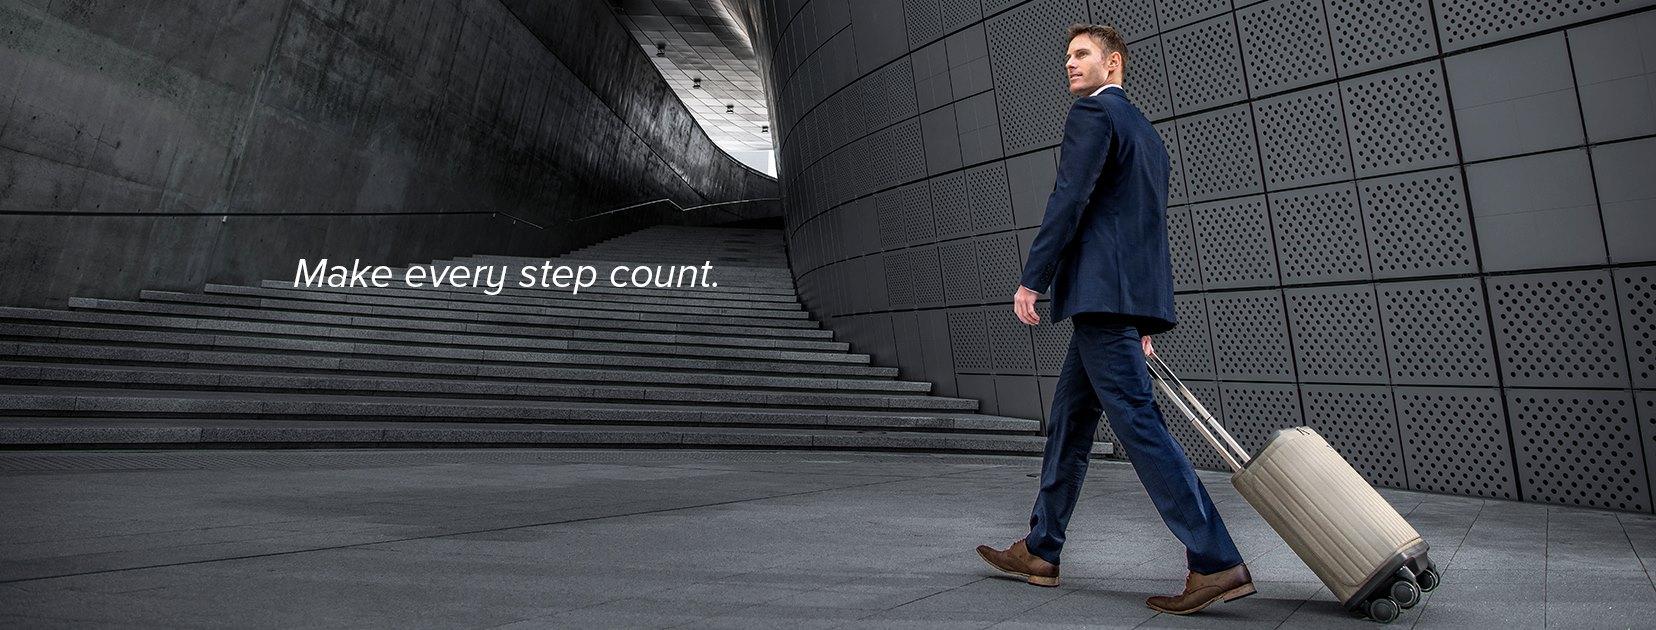 Rollogo-Escape-smart-luggage-mobile-office-business-man-walking.jpg